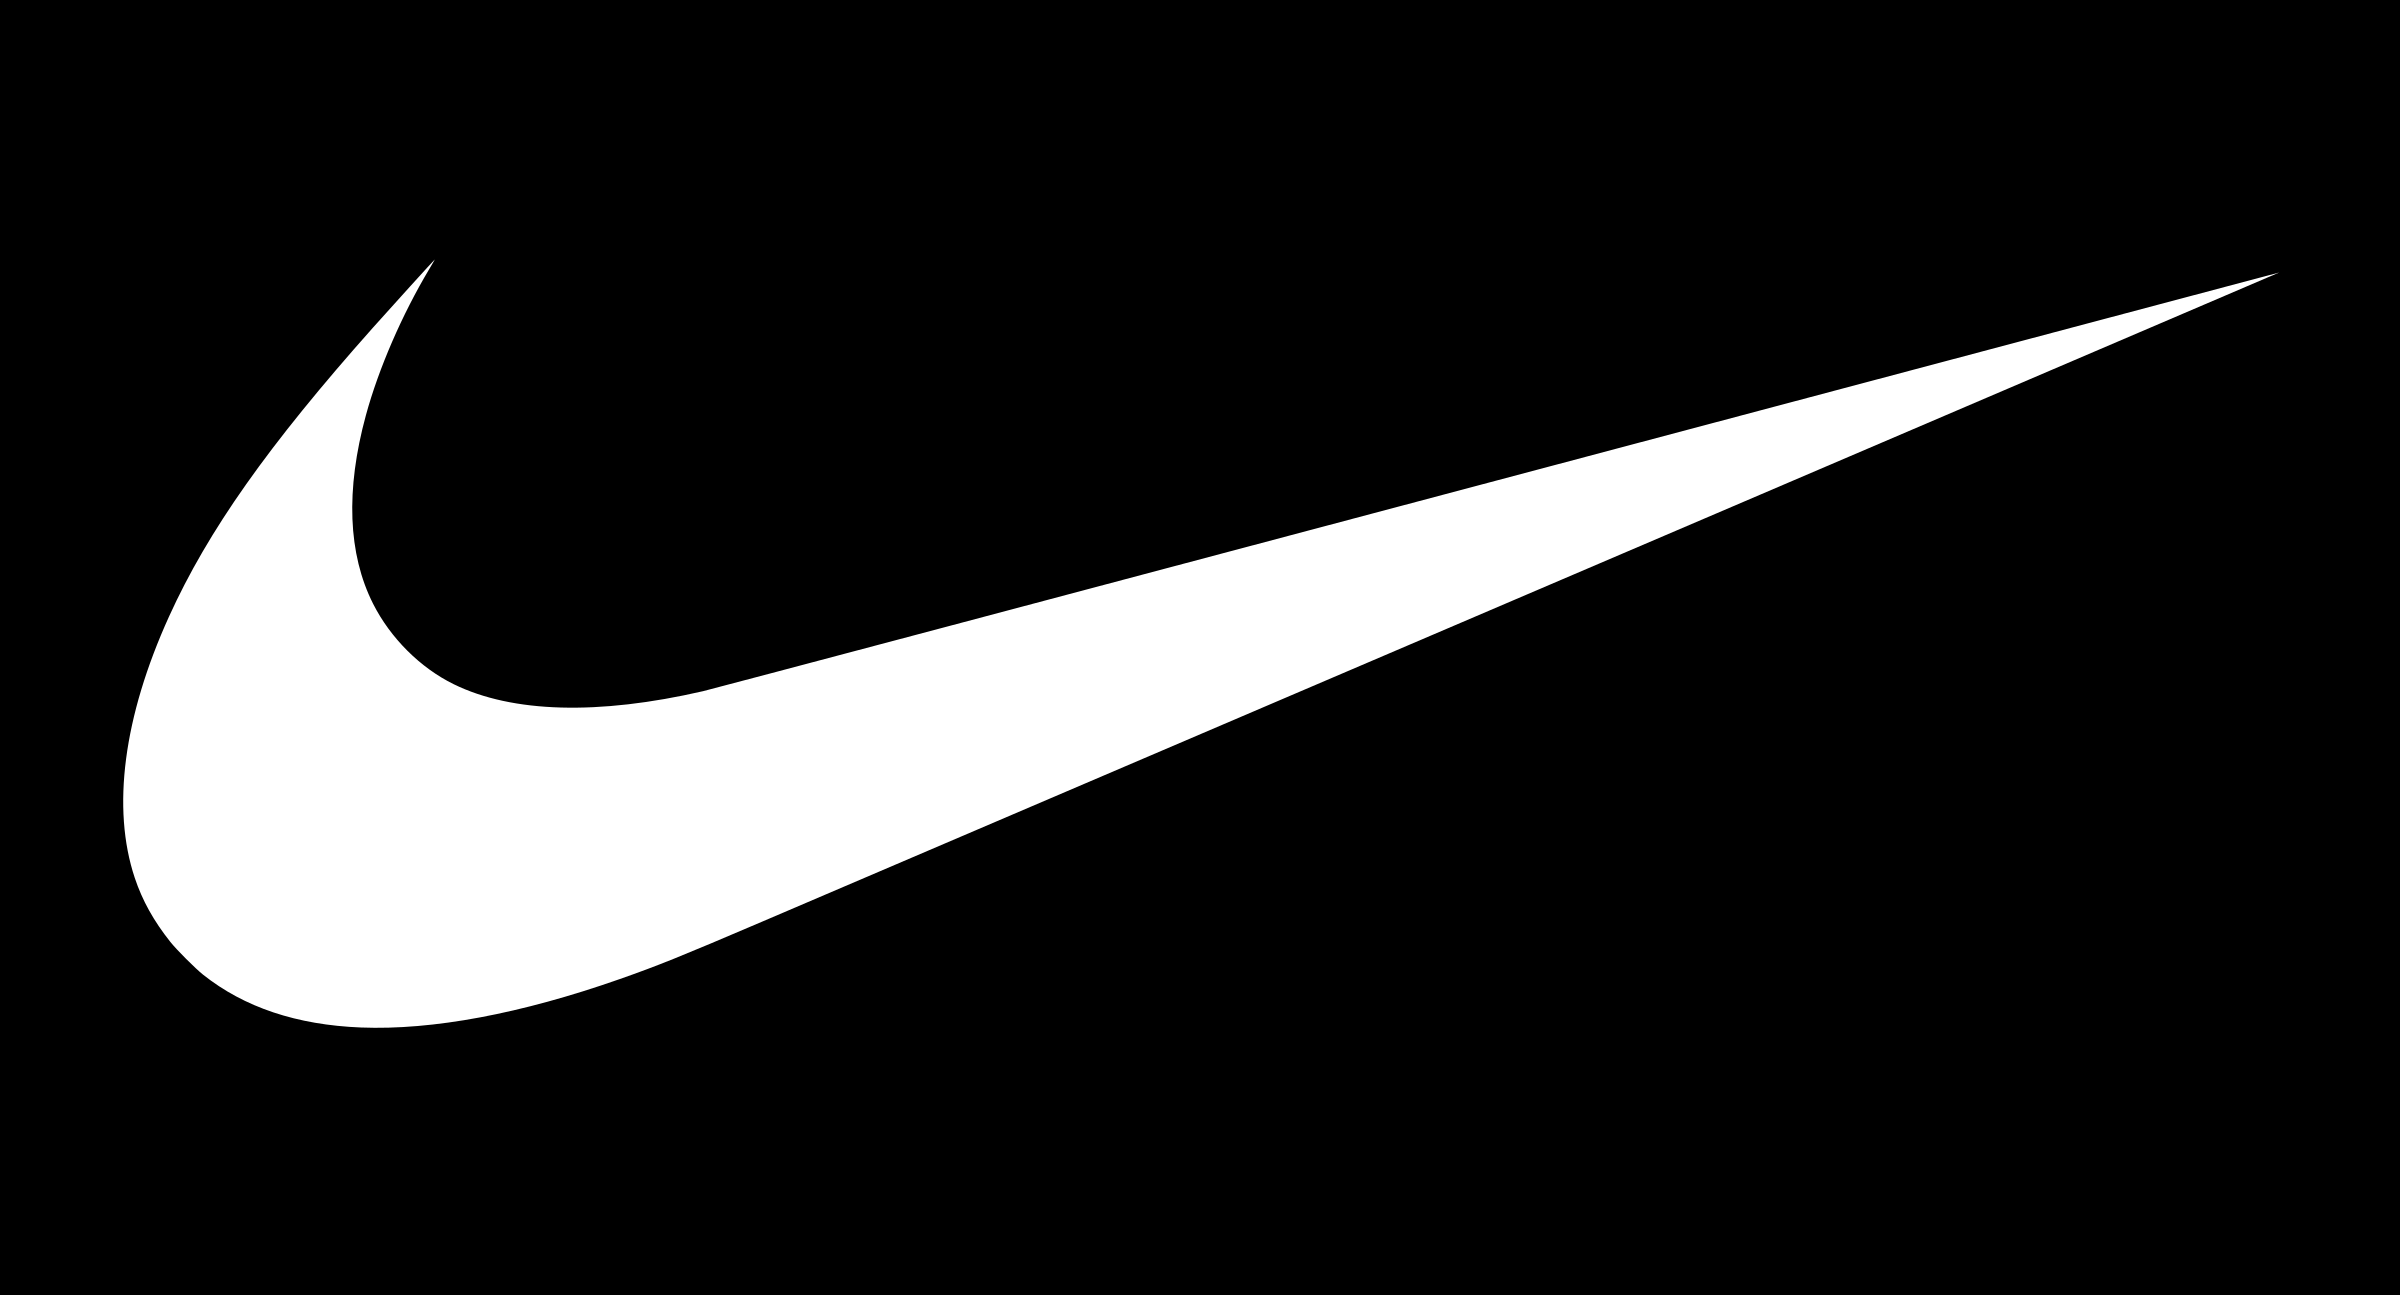 white nike logos on black background